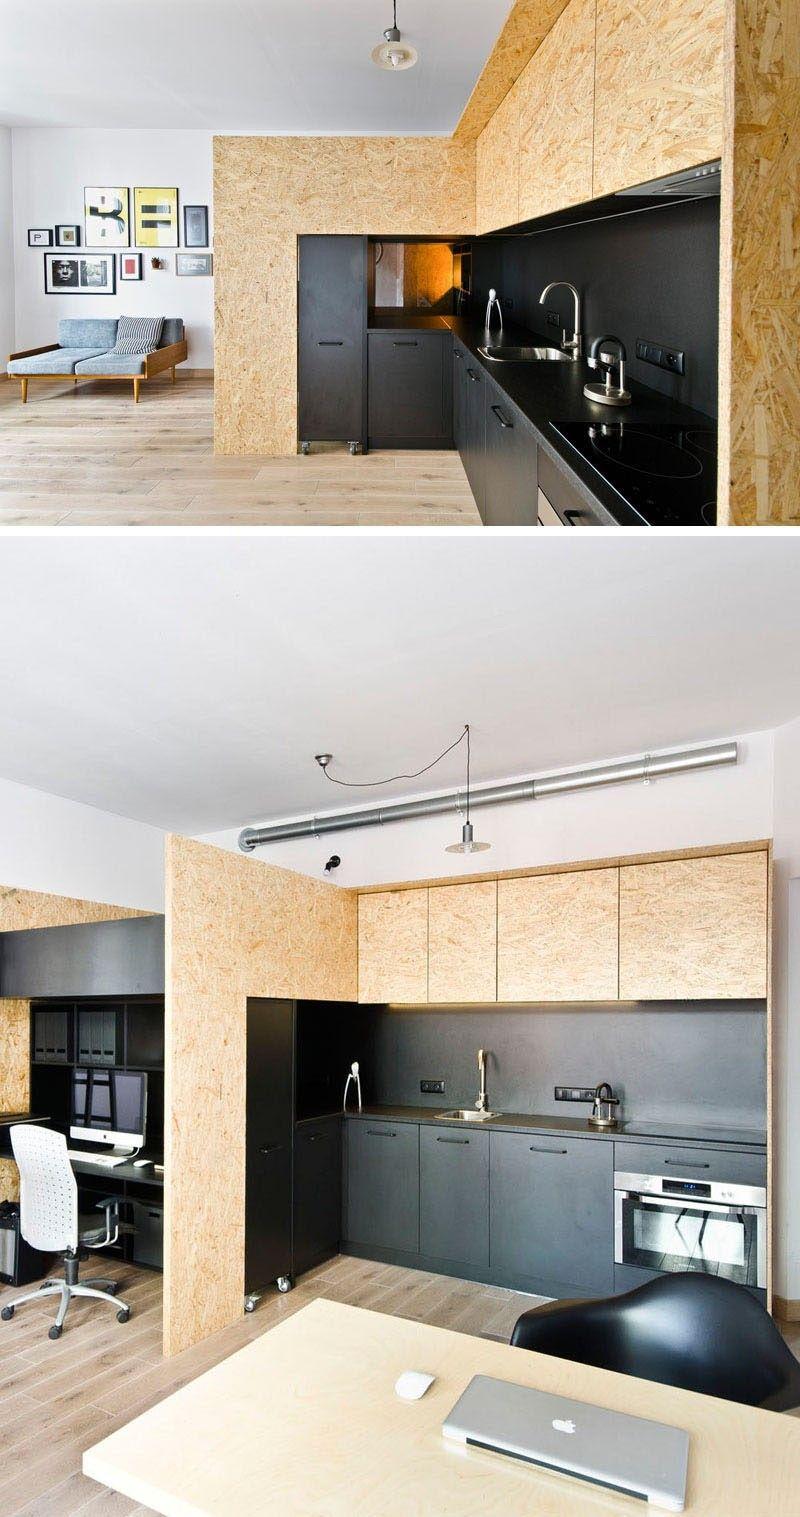 Großzügig Kleine Raum Küche Ideen Ideen - Küchen Design Ideen ...